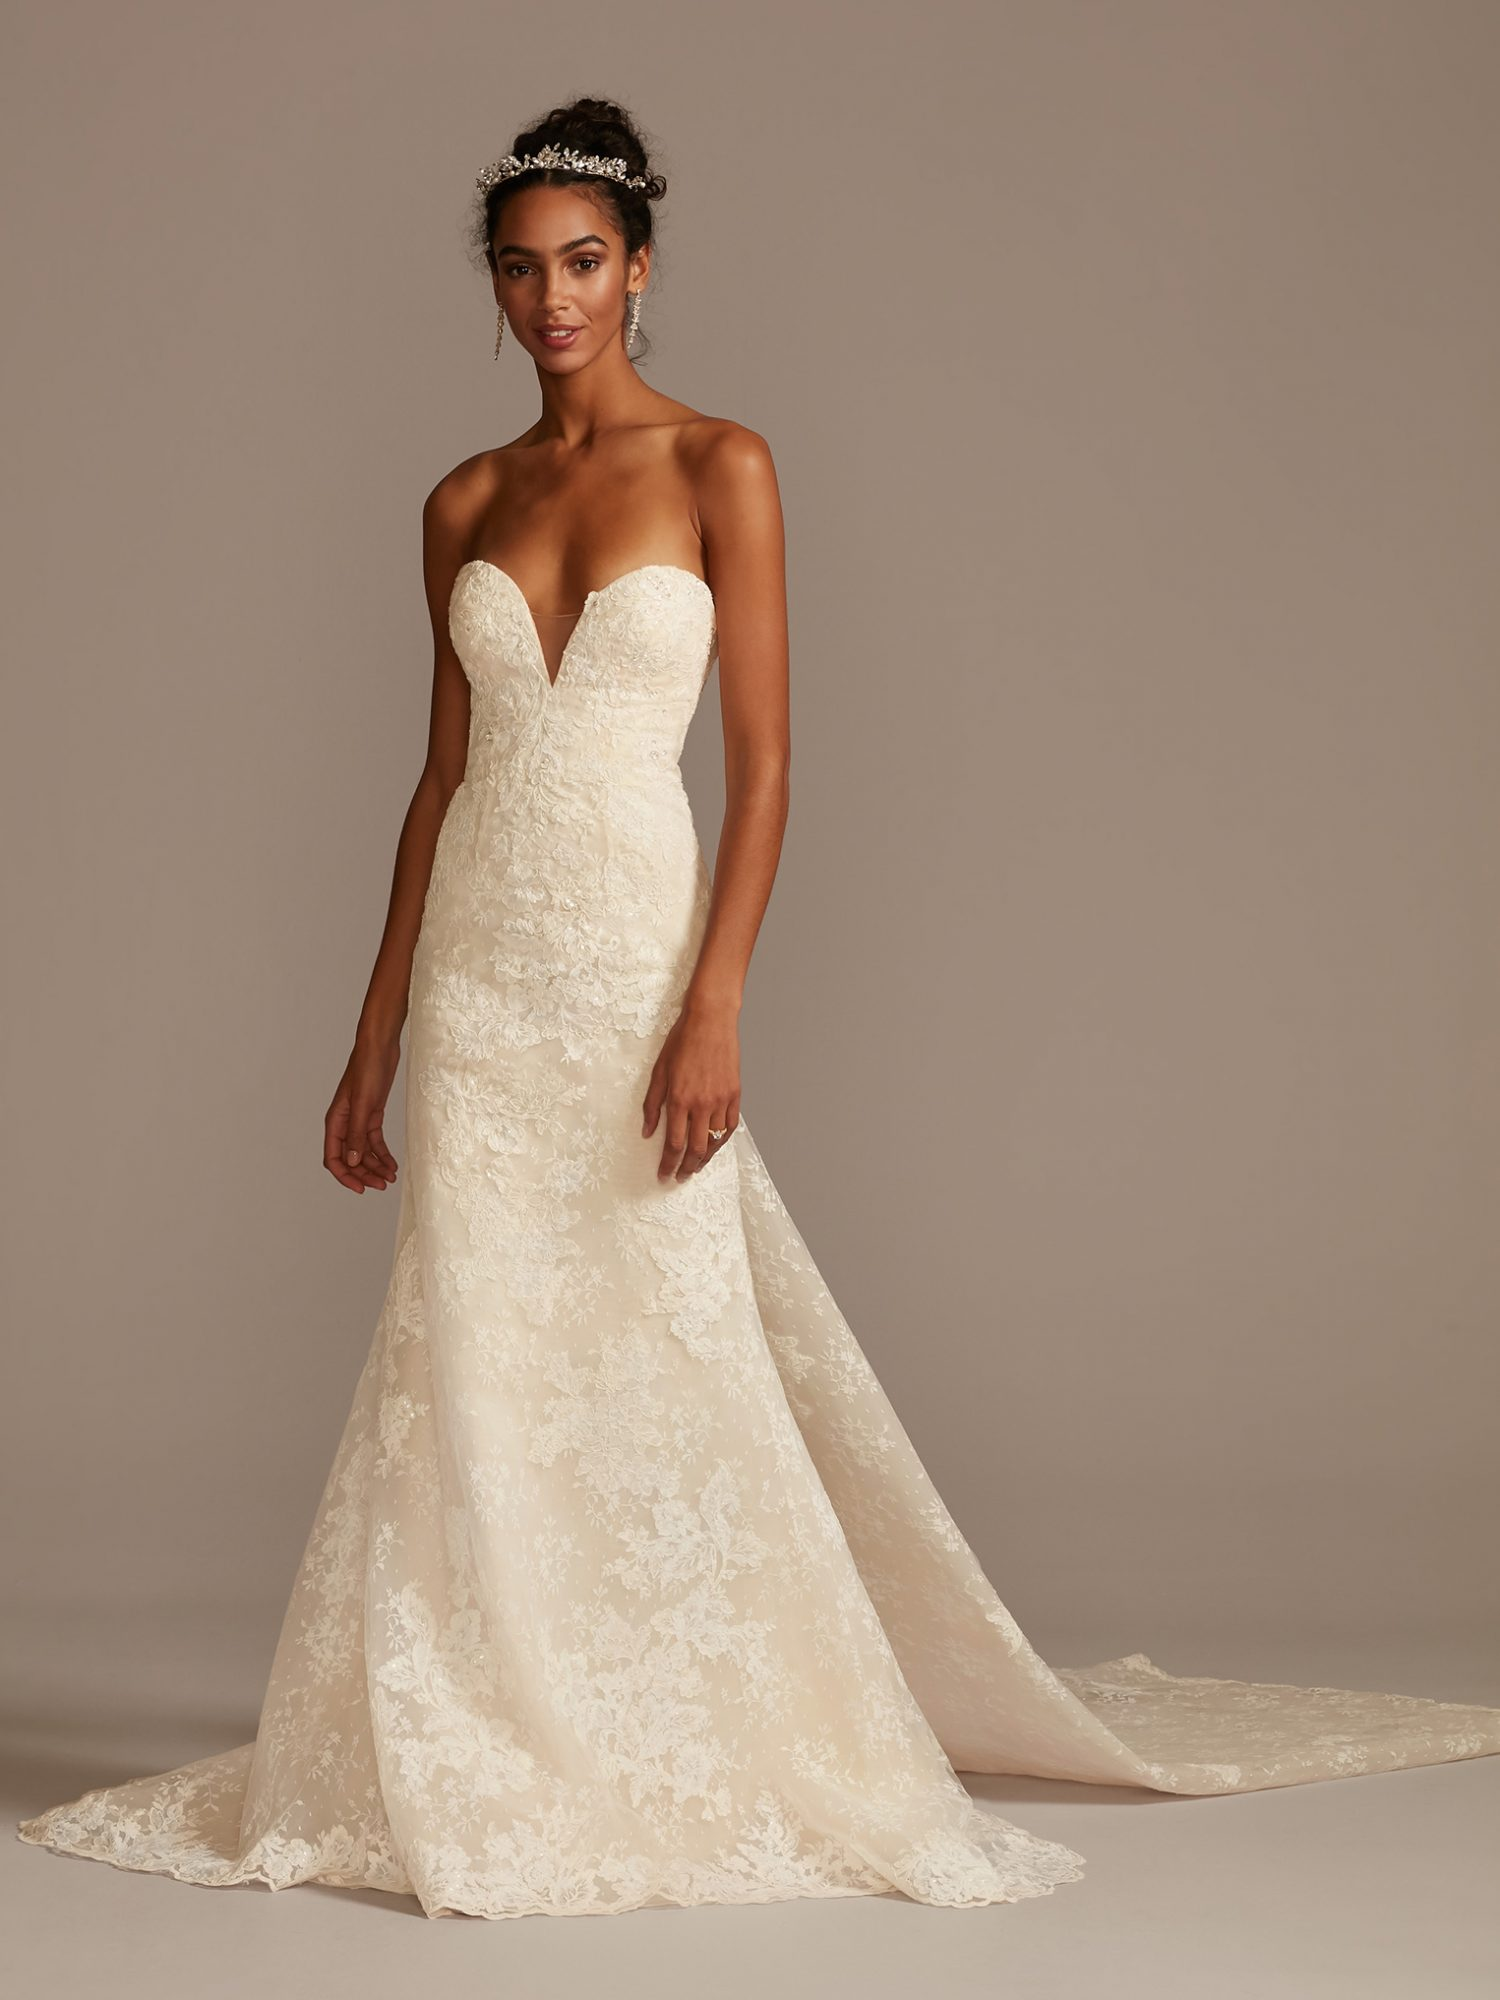 davids bridal strapless v-neck train wedding dress spring 2021